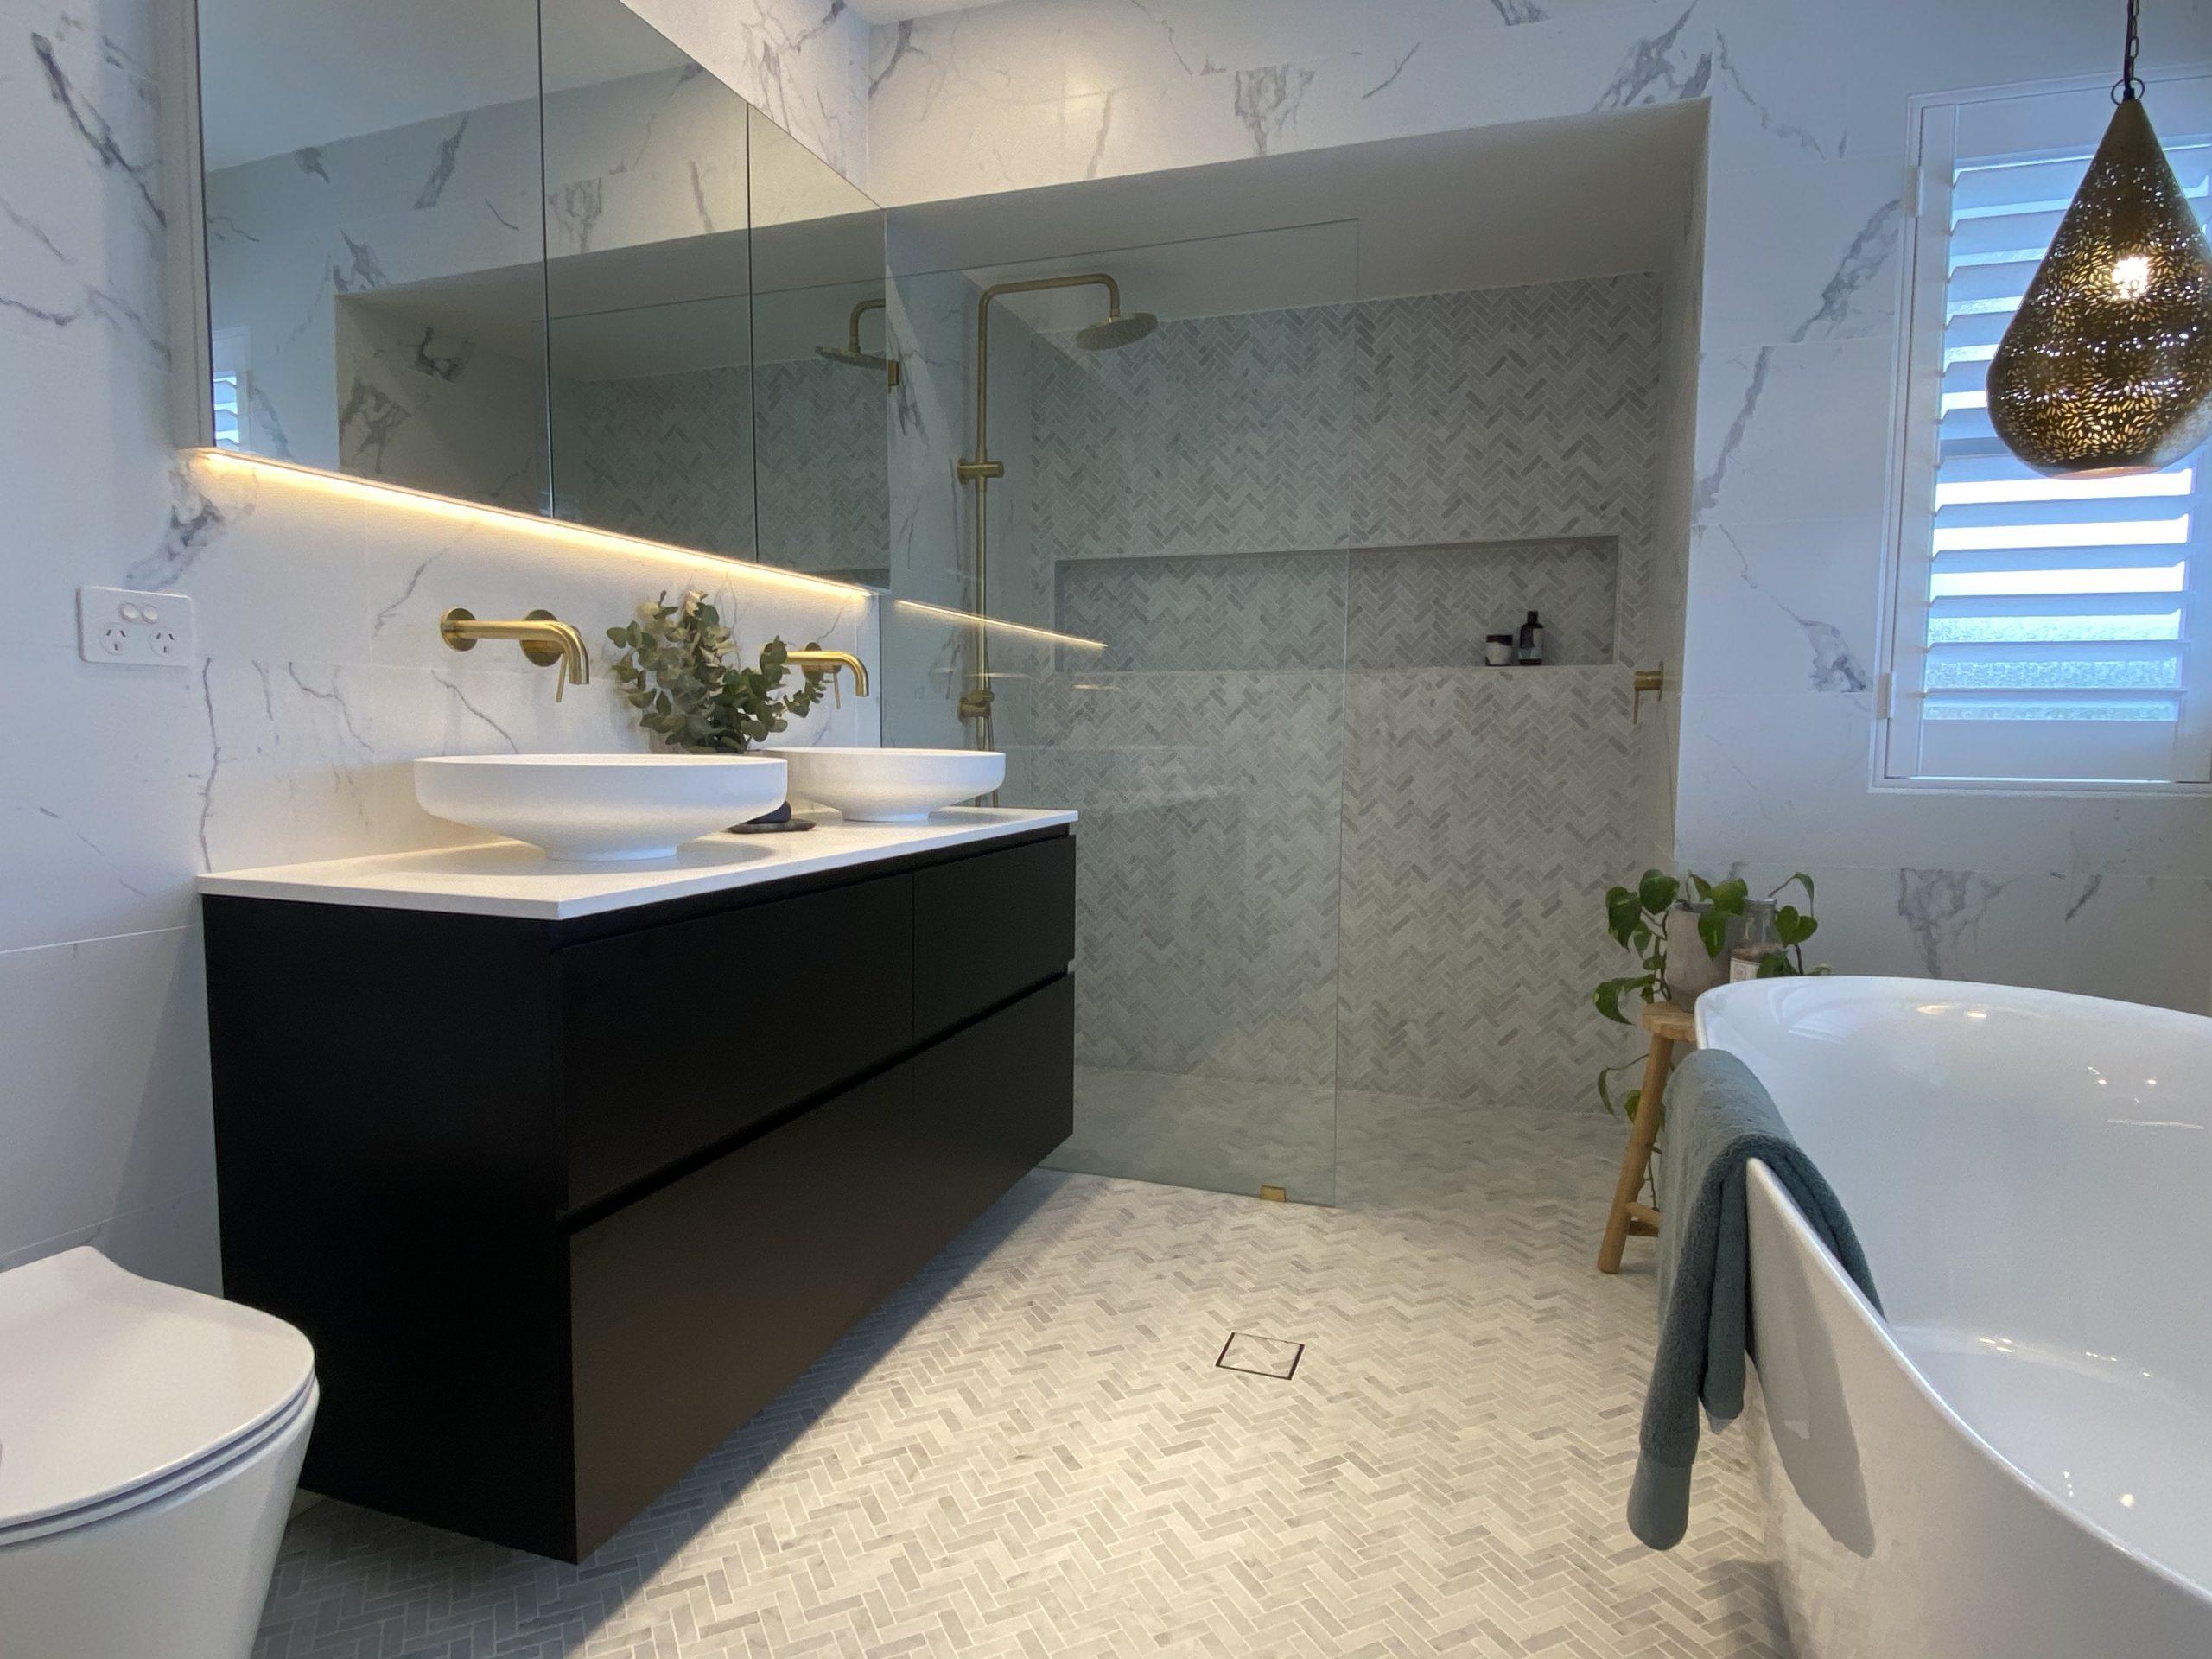 Caringbah South Sutherland Shire Bathroom Renovations